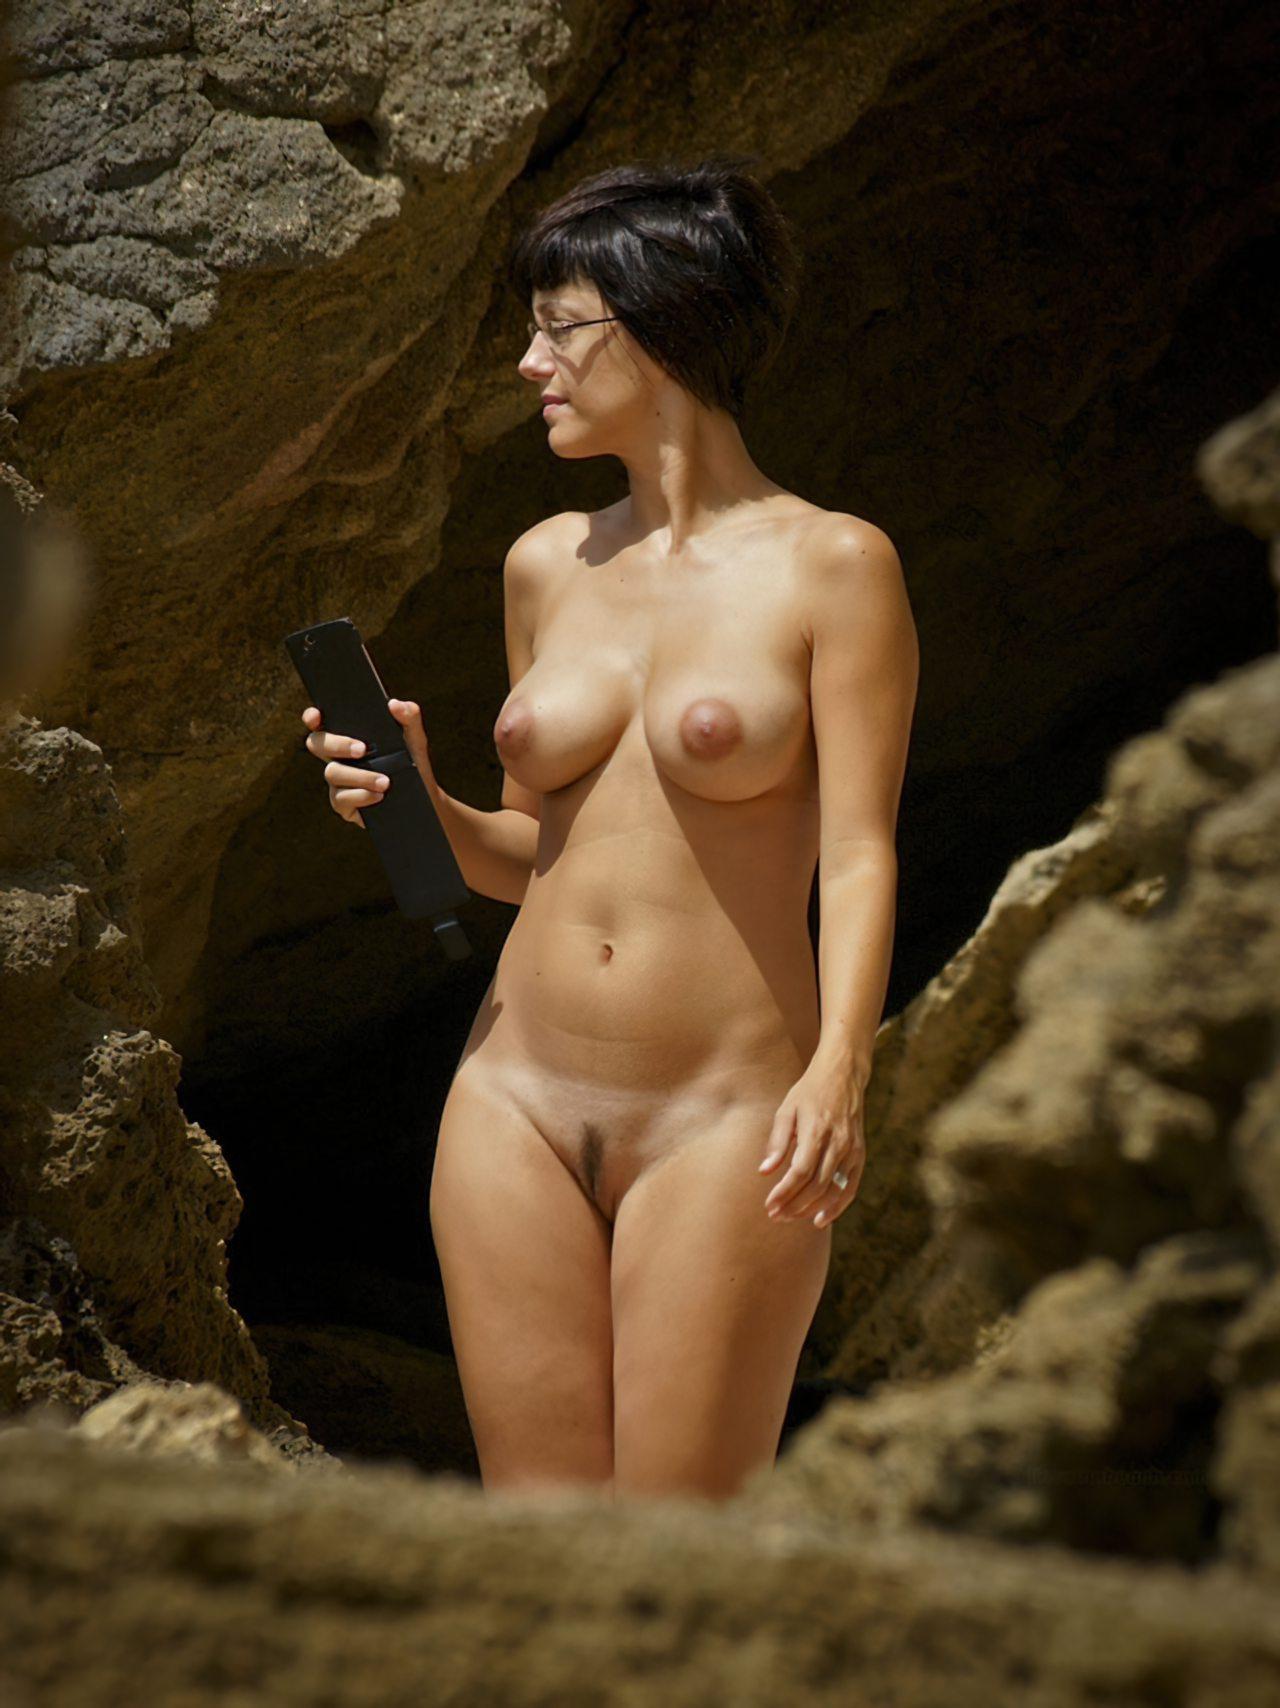 Mulher Pelada Praia Nudista (6)